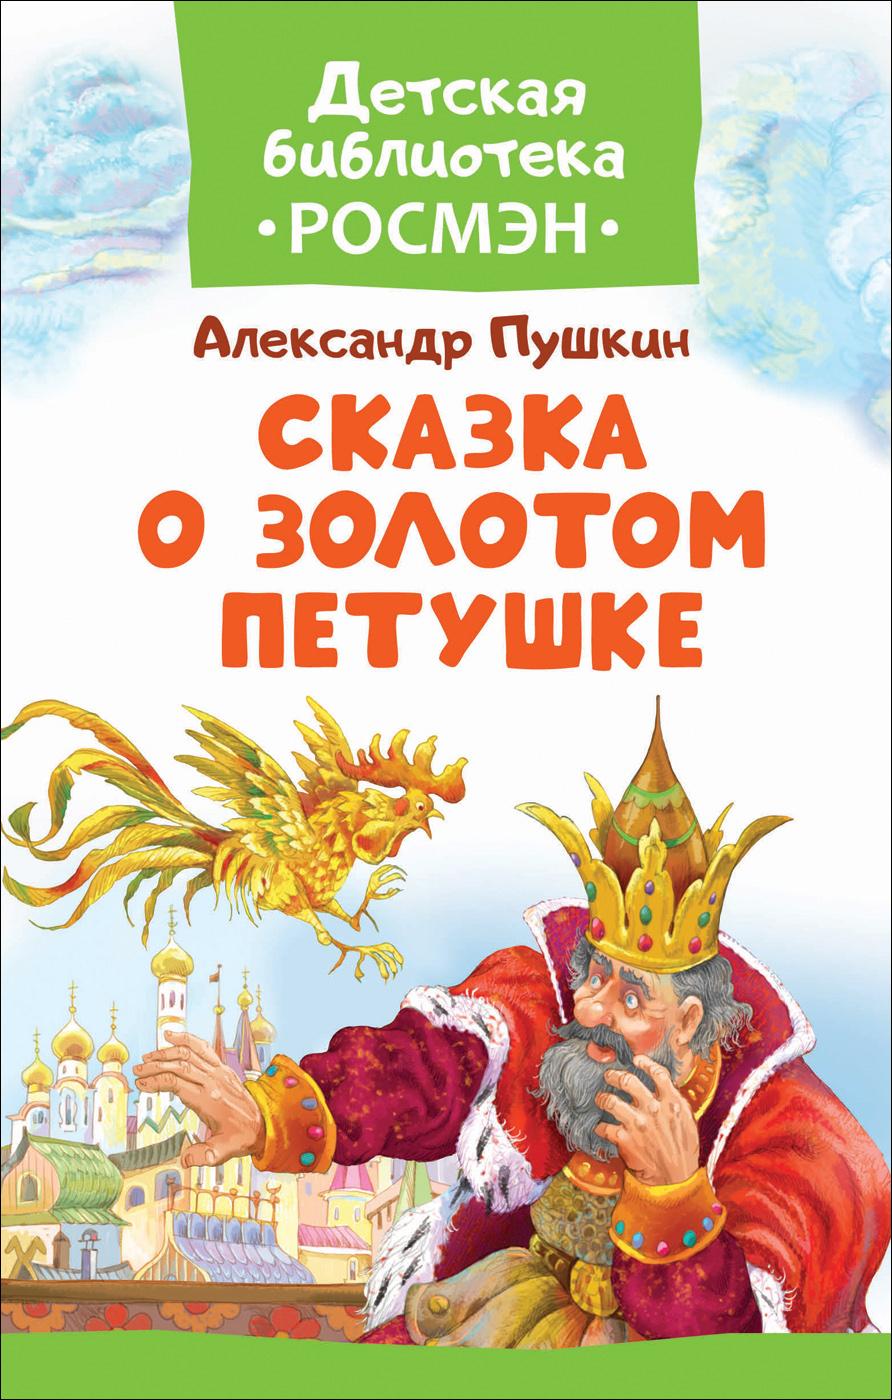 Пушкин А.С. Пушкин А. С. Сказка о Золотом Петушке (ДБ РОСМЭН)